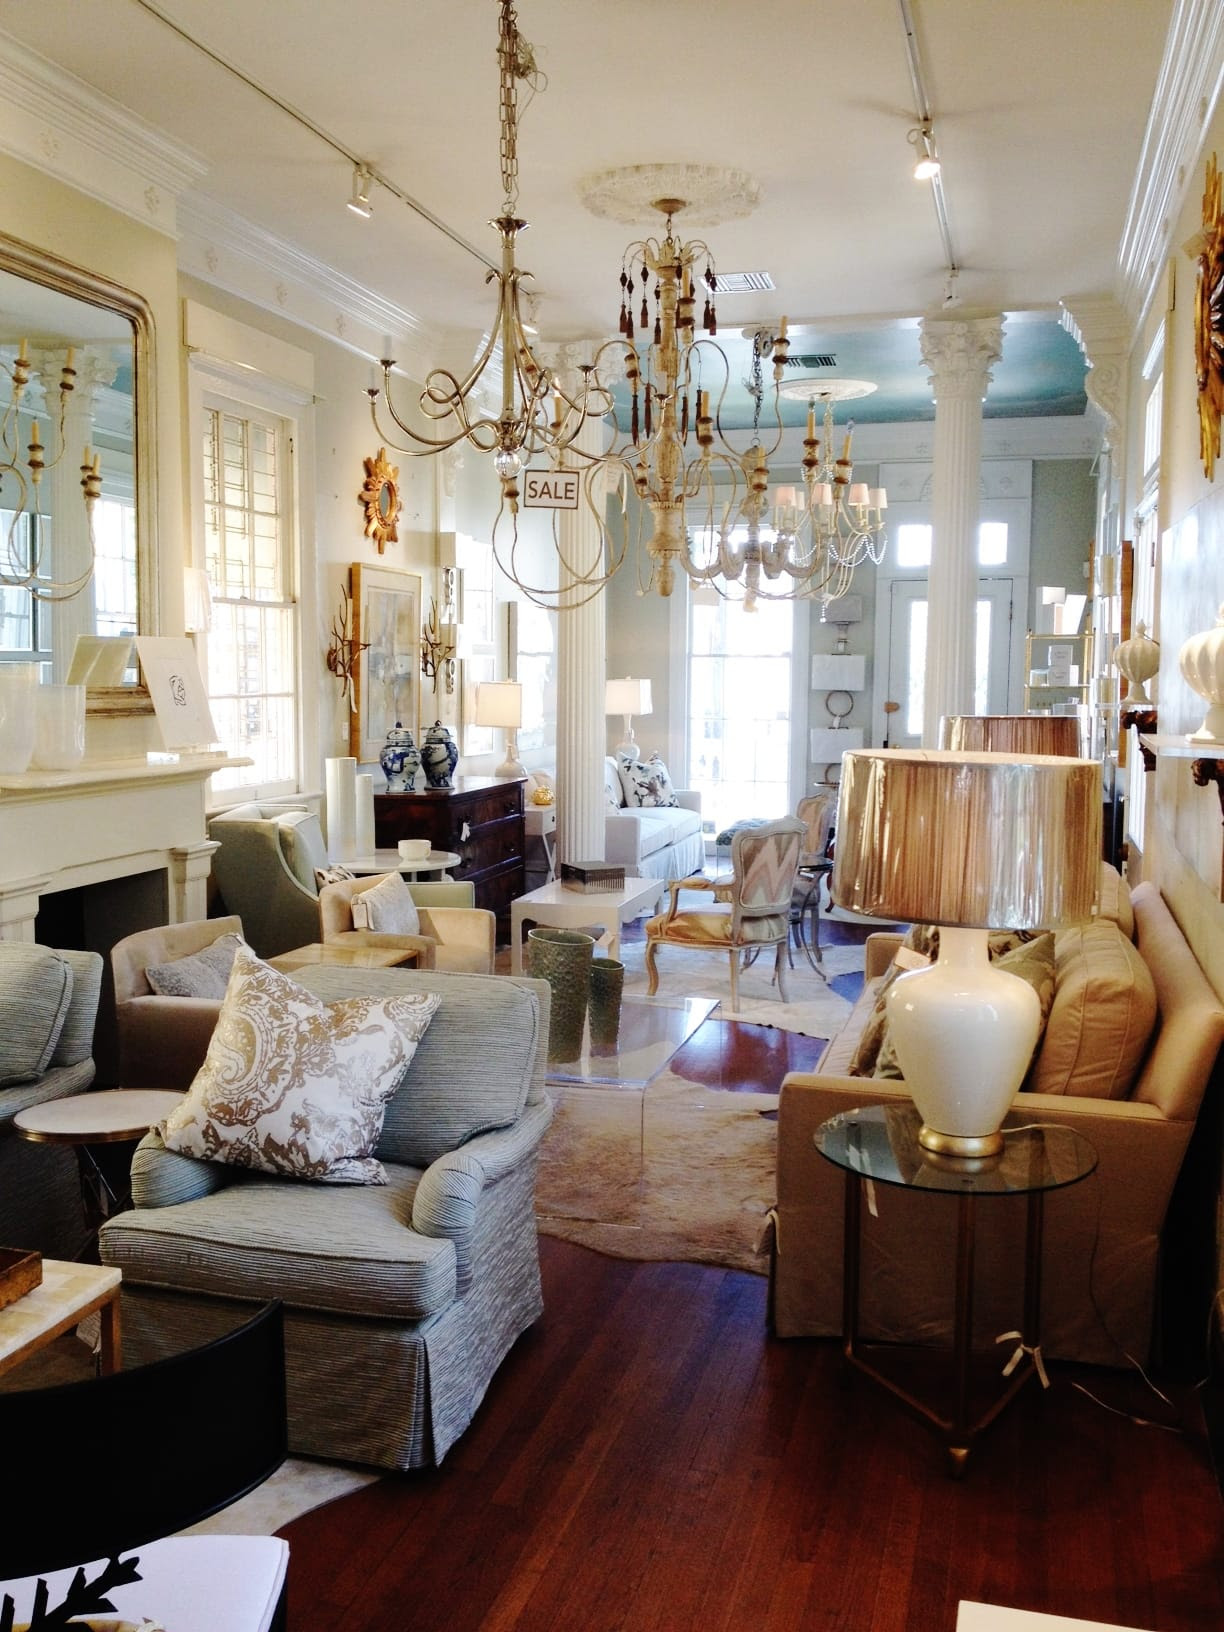 French quarter style home decor - House design plans